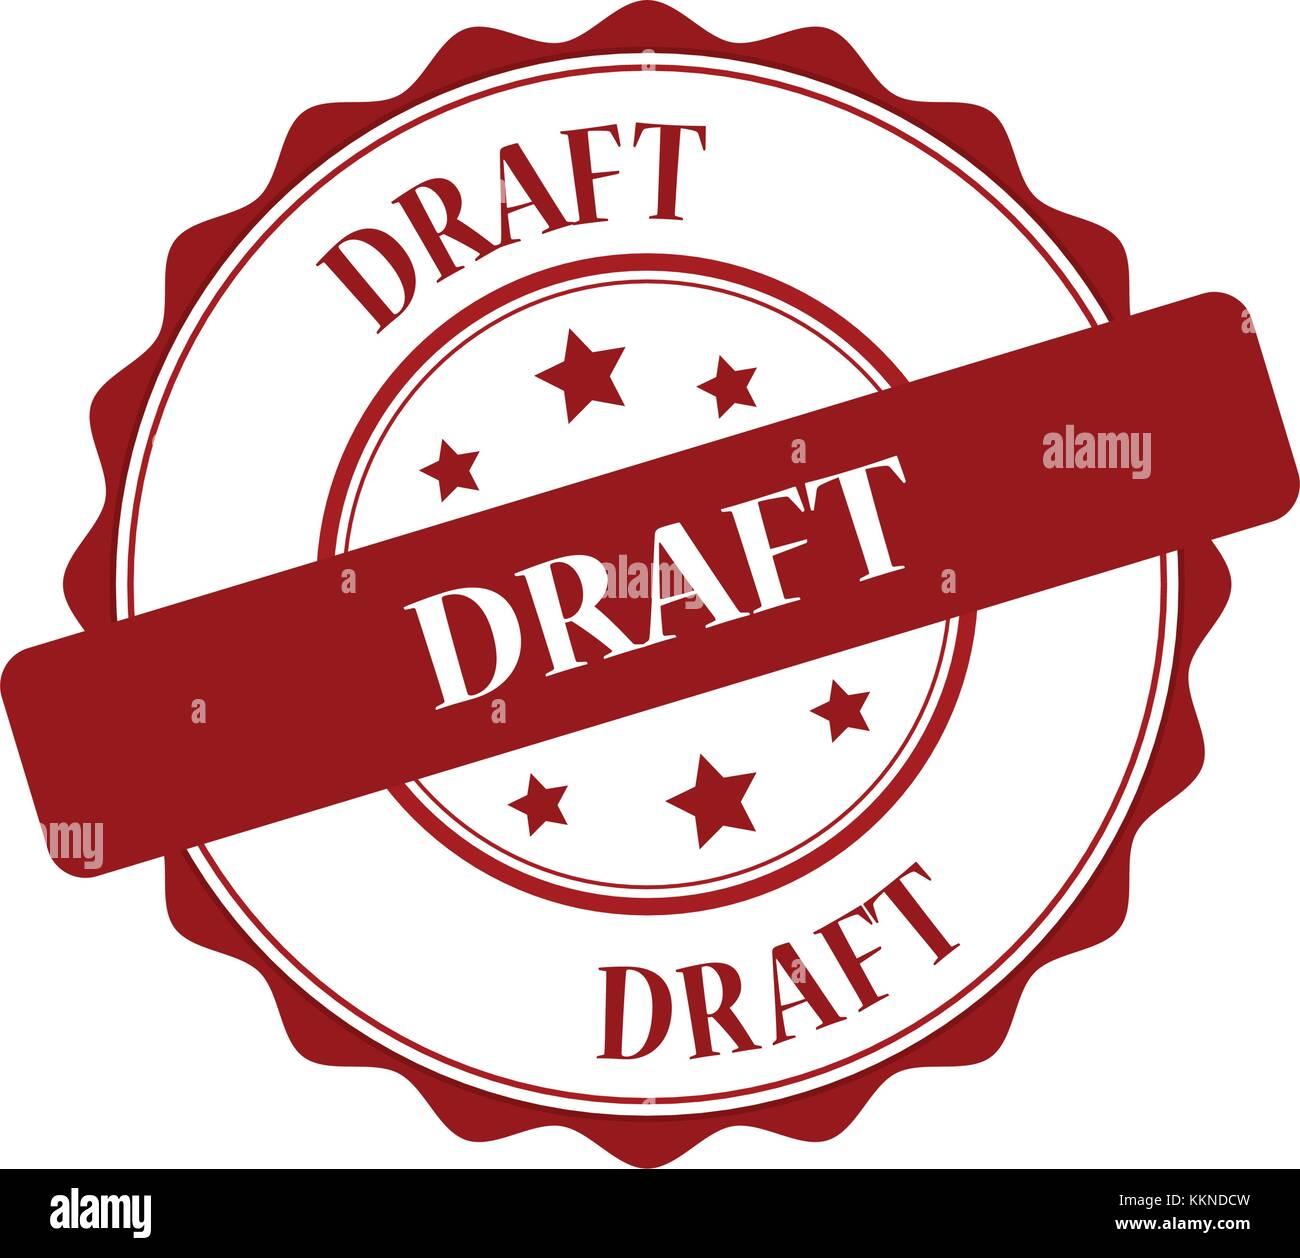 Draft stamp illustration - Stock Vector